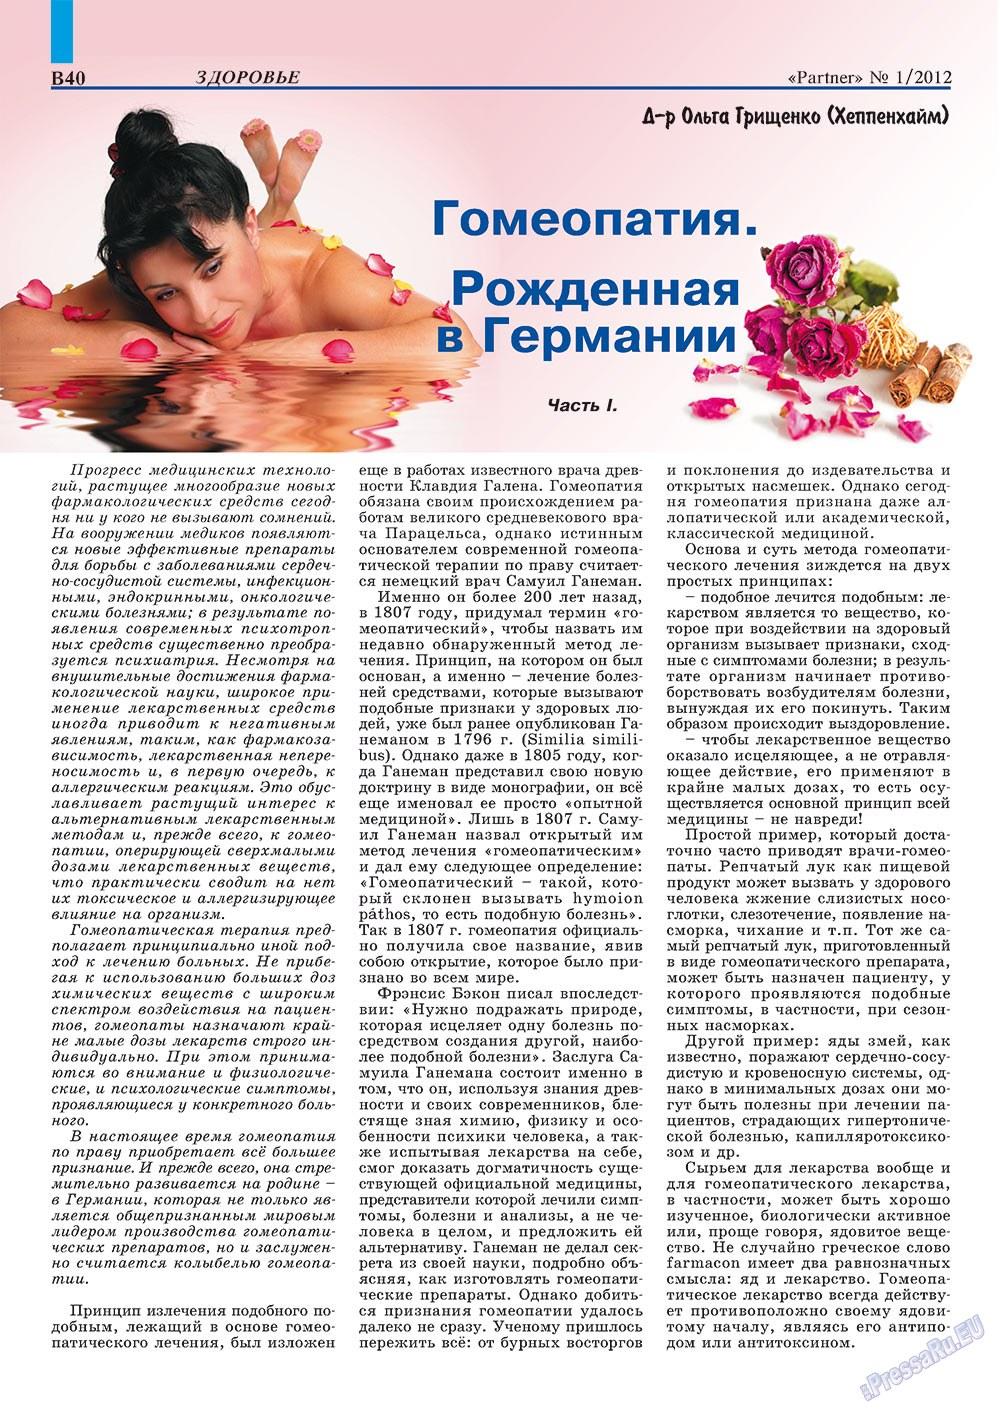 Партнер-север (журнал). 2012 год, номер 1, стр. 50